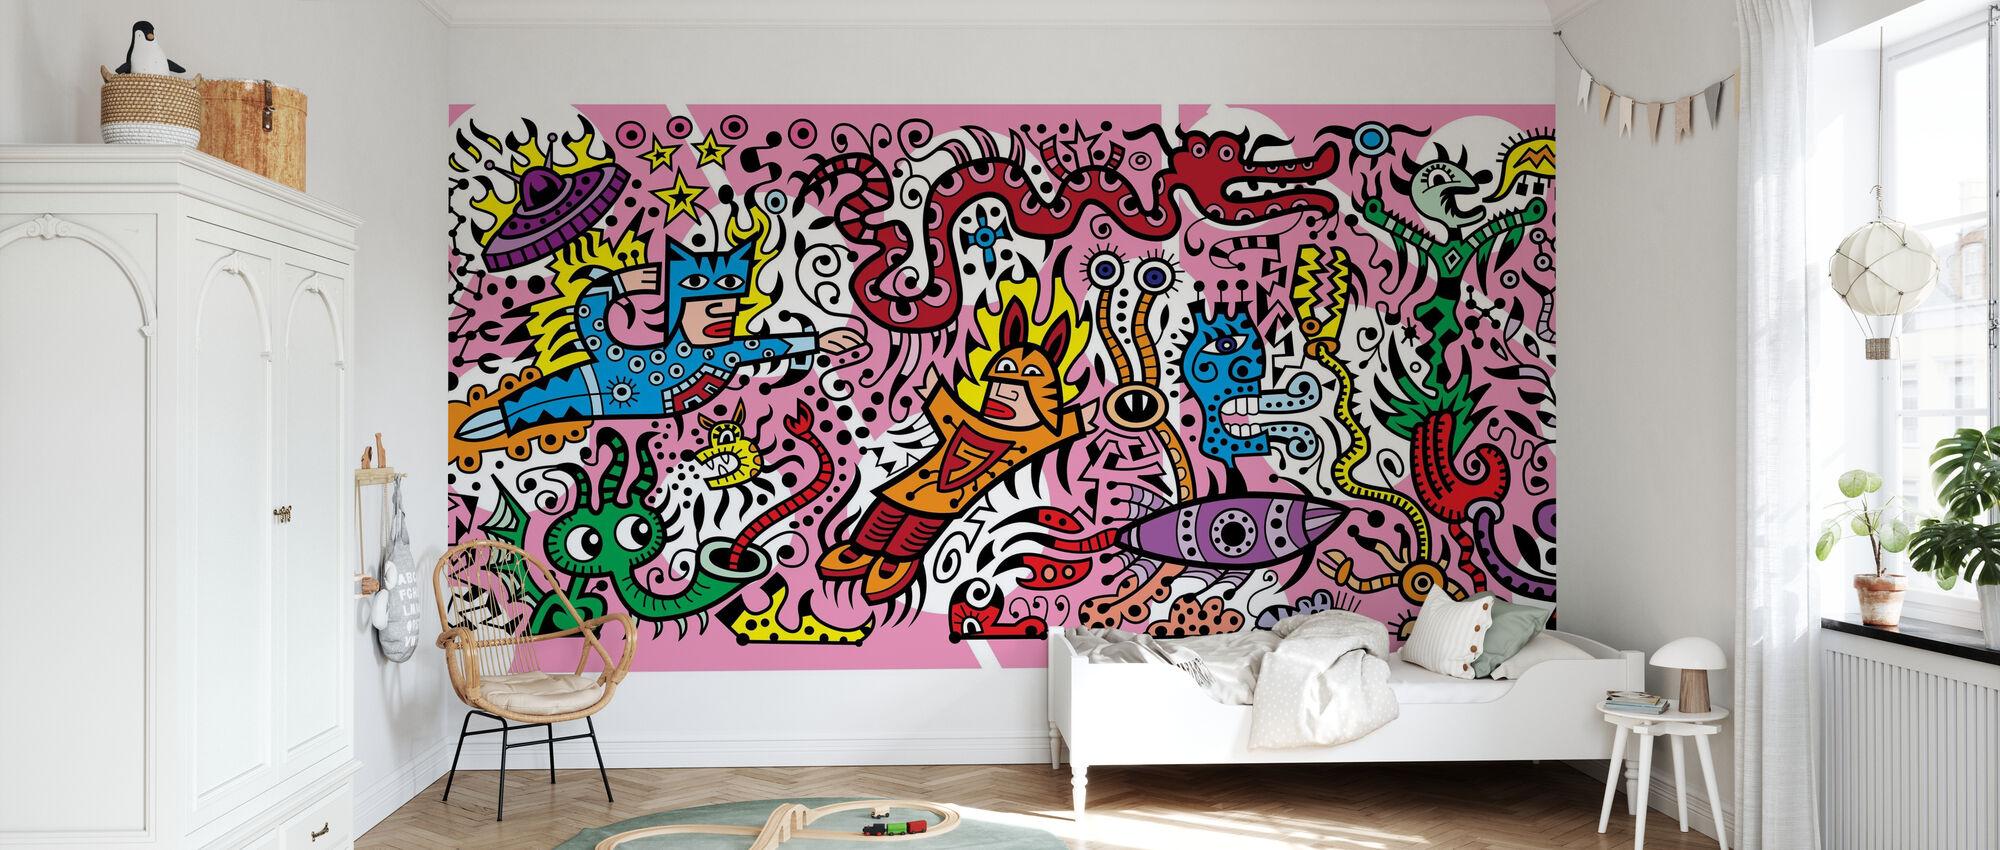 Superhero Fight - Wallpaper - Kids Room